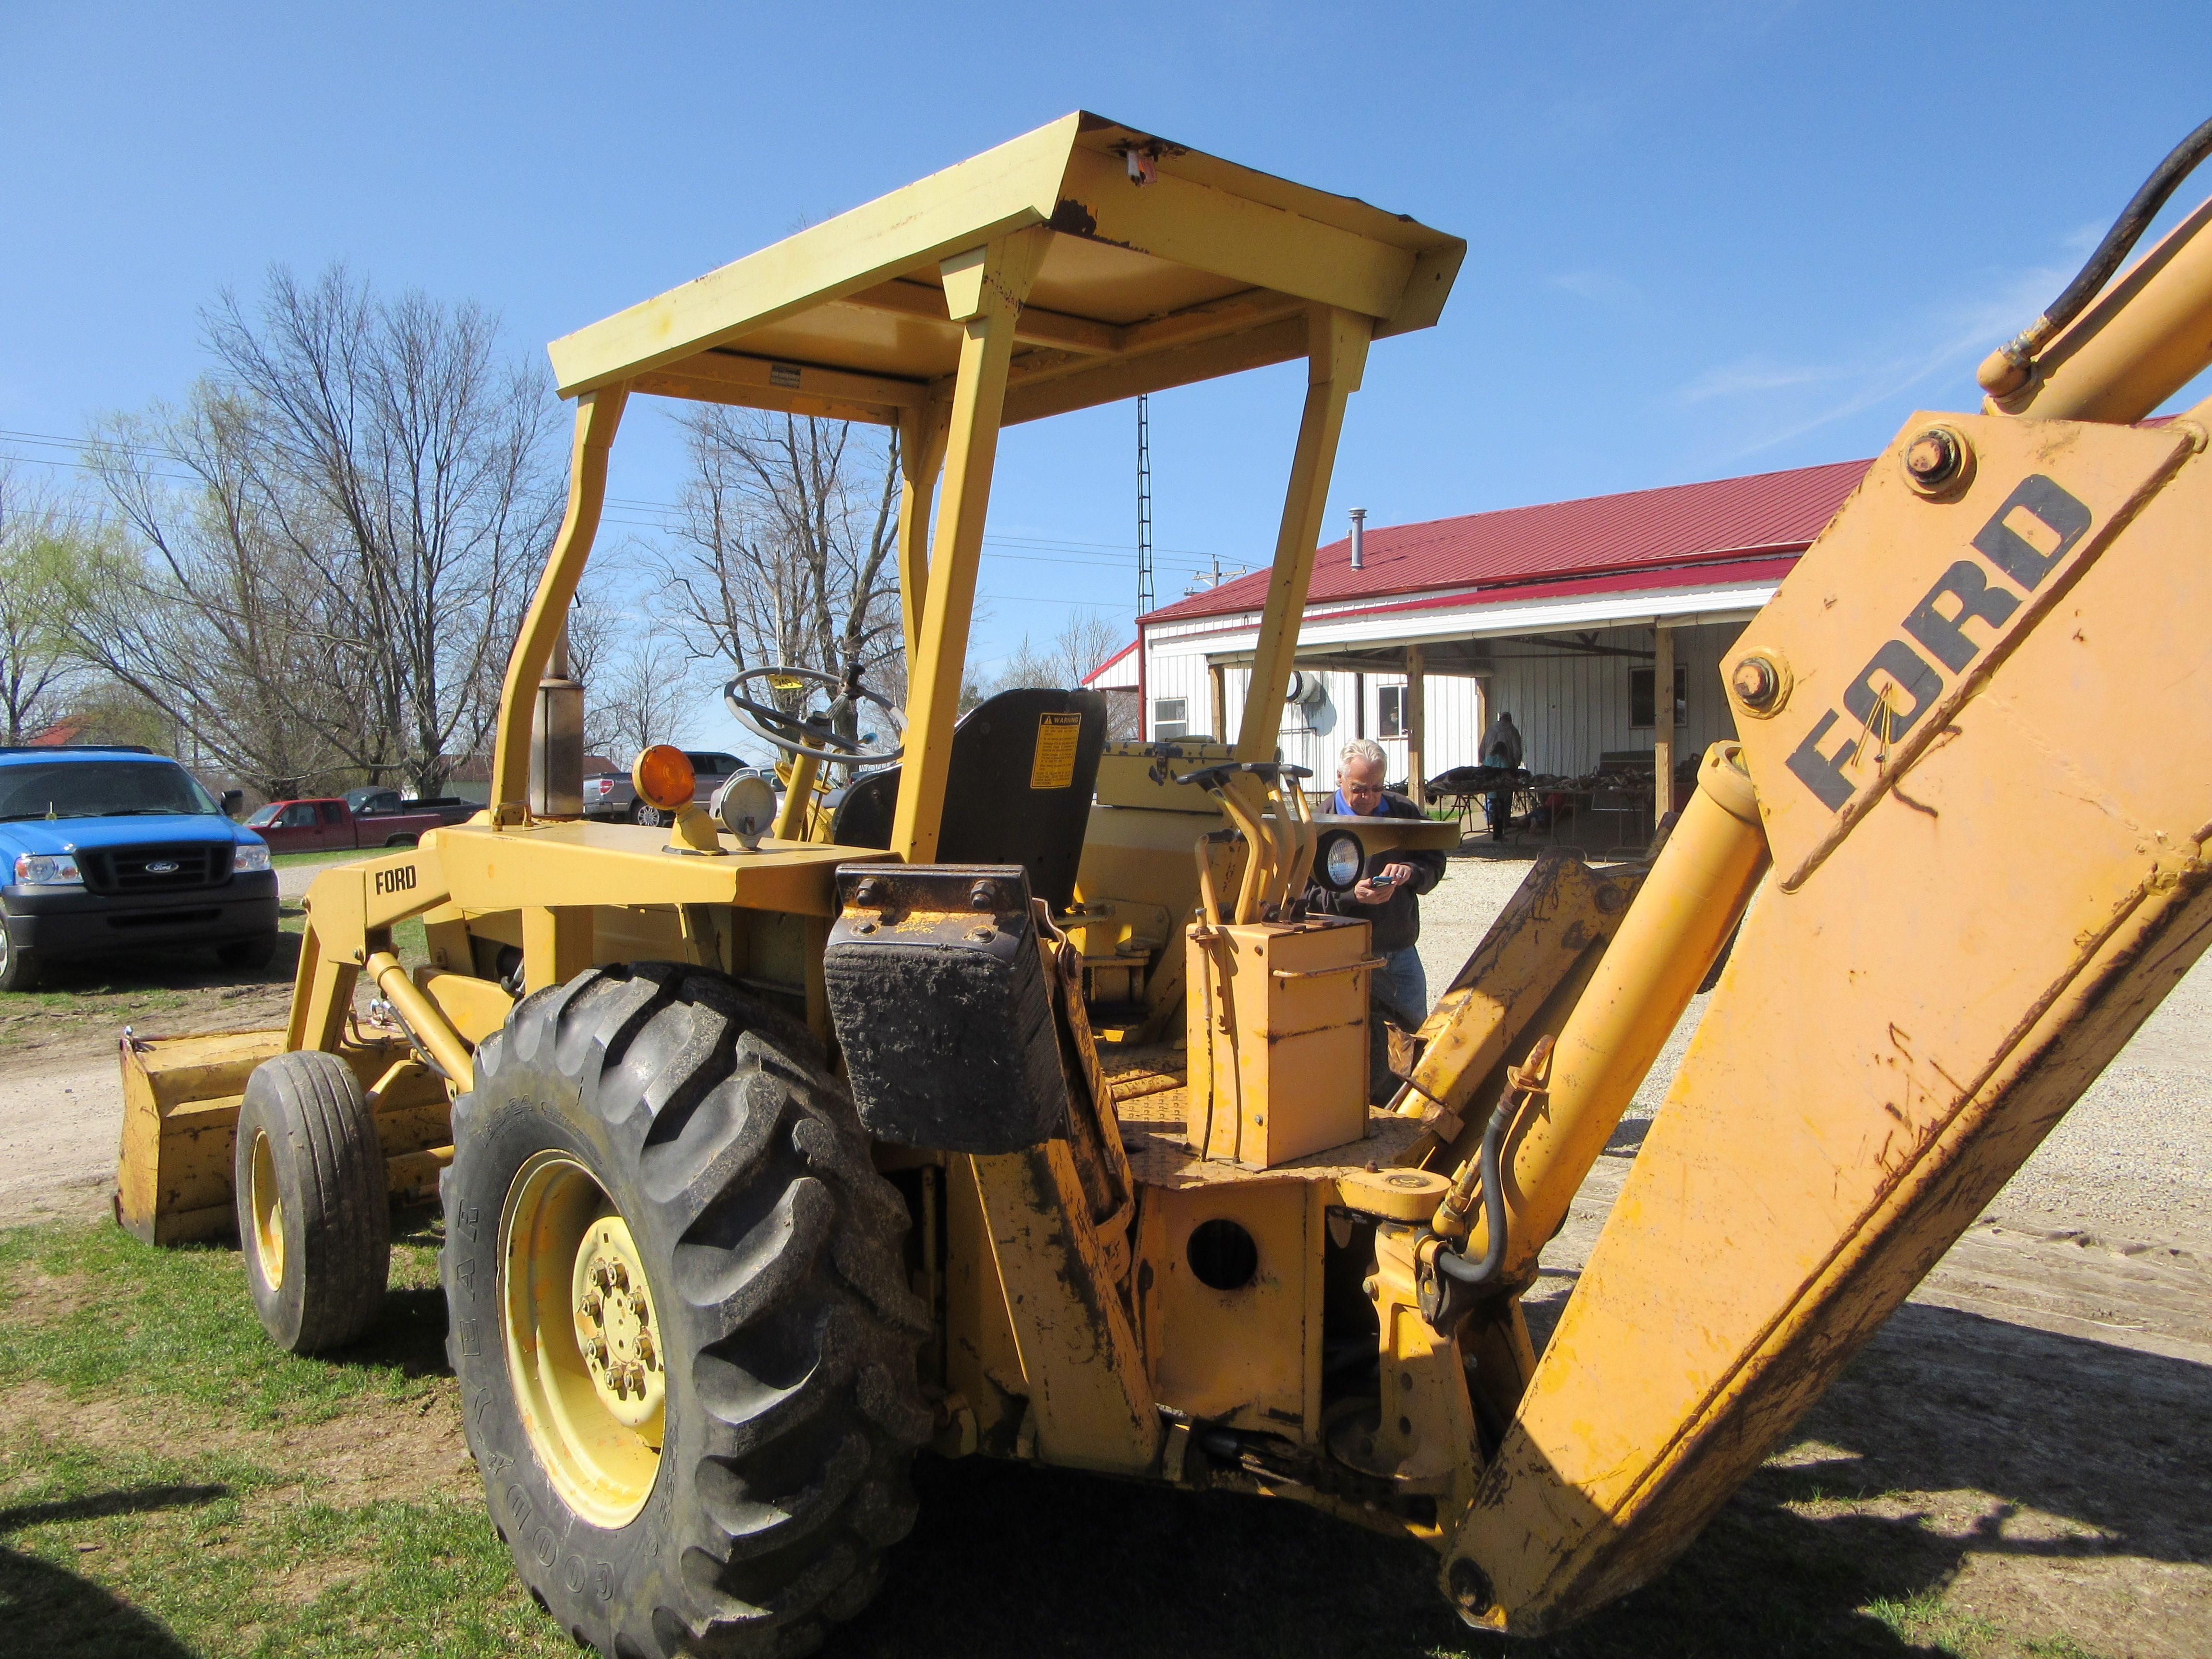 Ford 3550 Backhoe Ford Tractors Amp Equipment border=